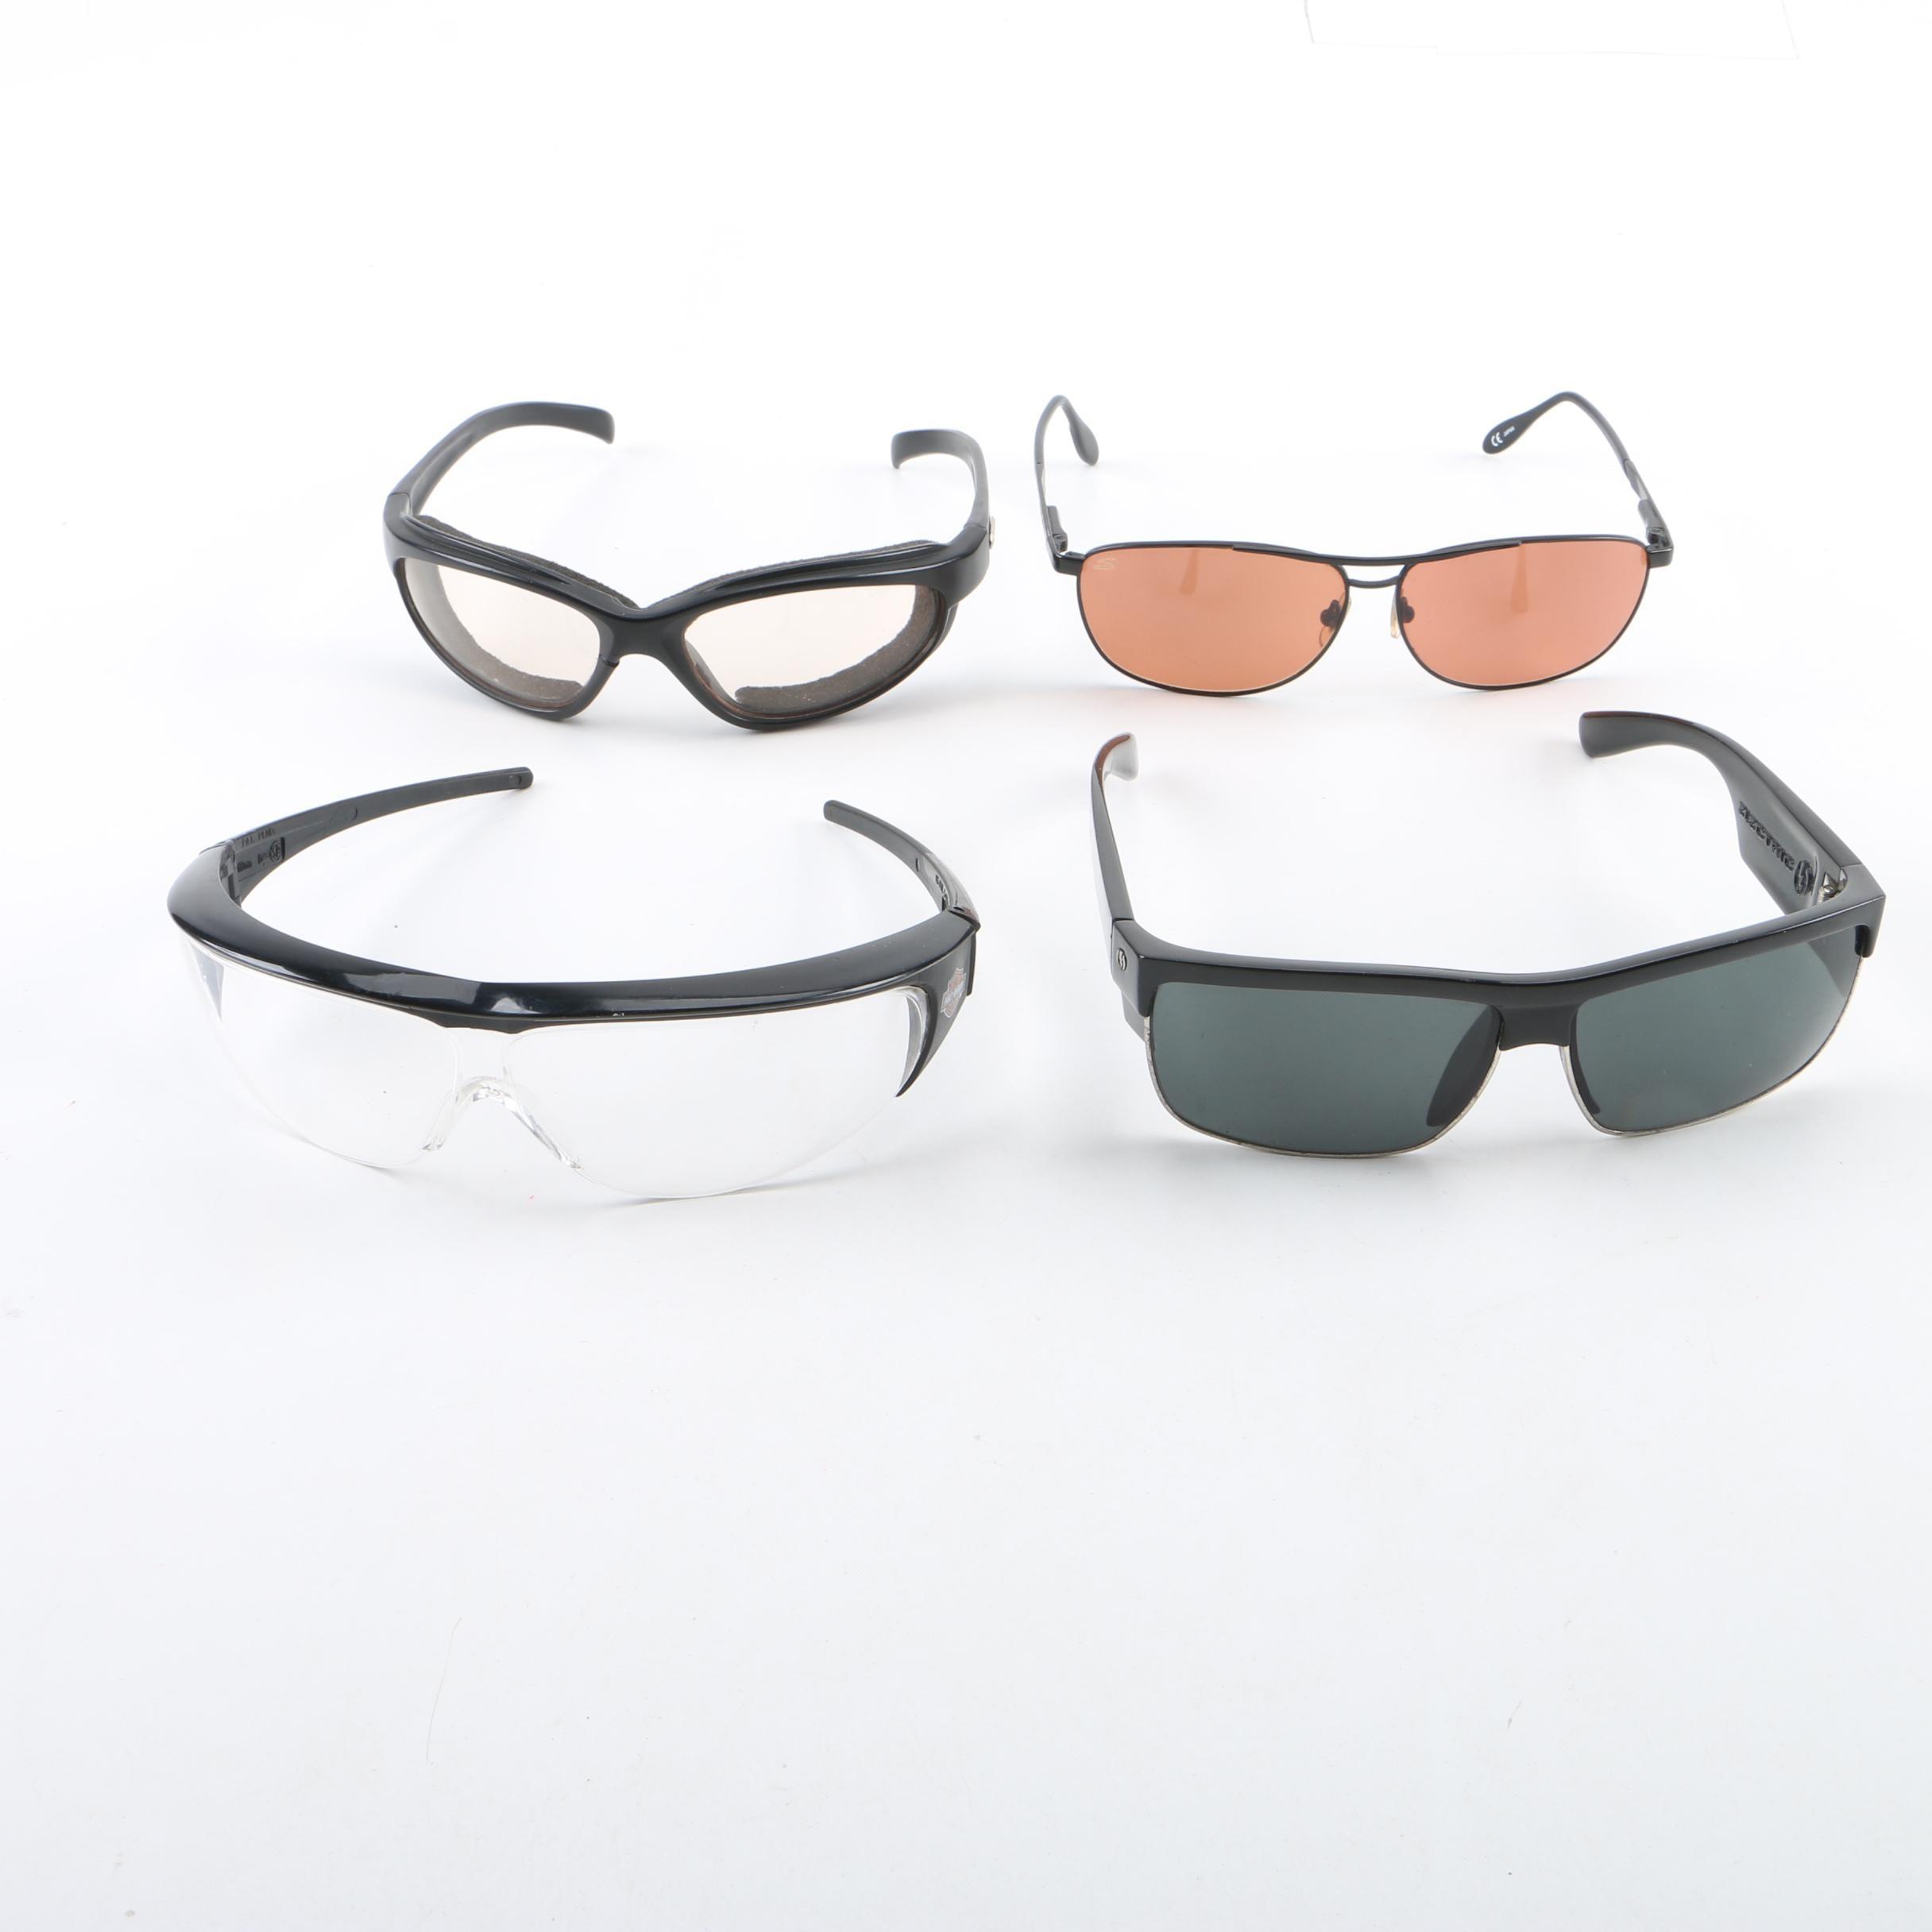 Sunglasses and Protective Eyewear Including Harley-Davidson and Serengeti